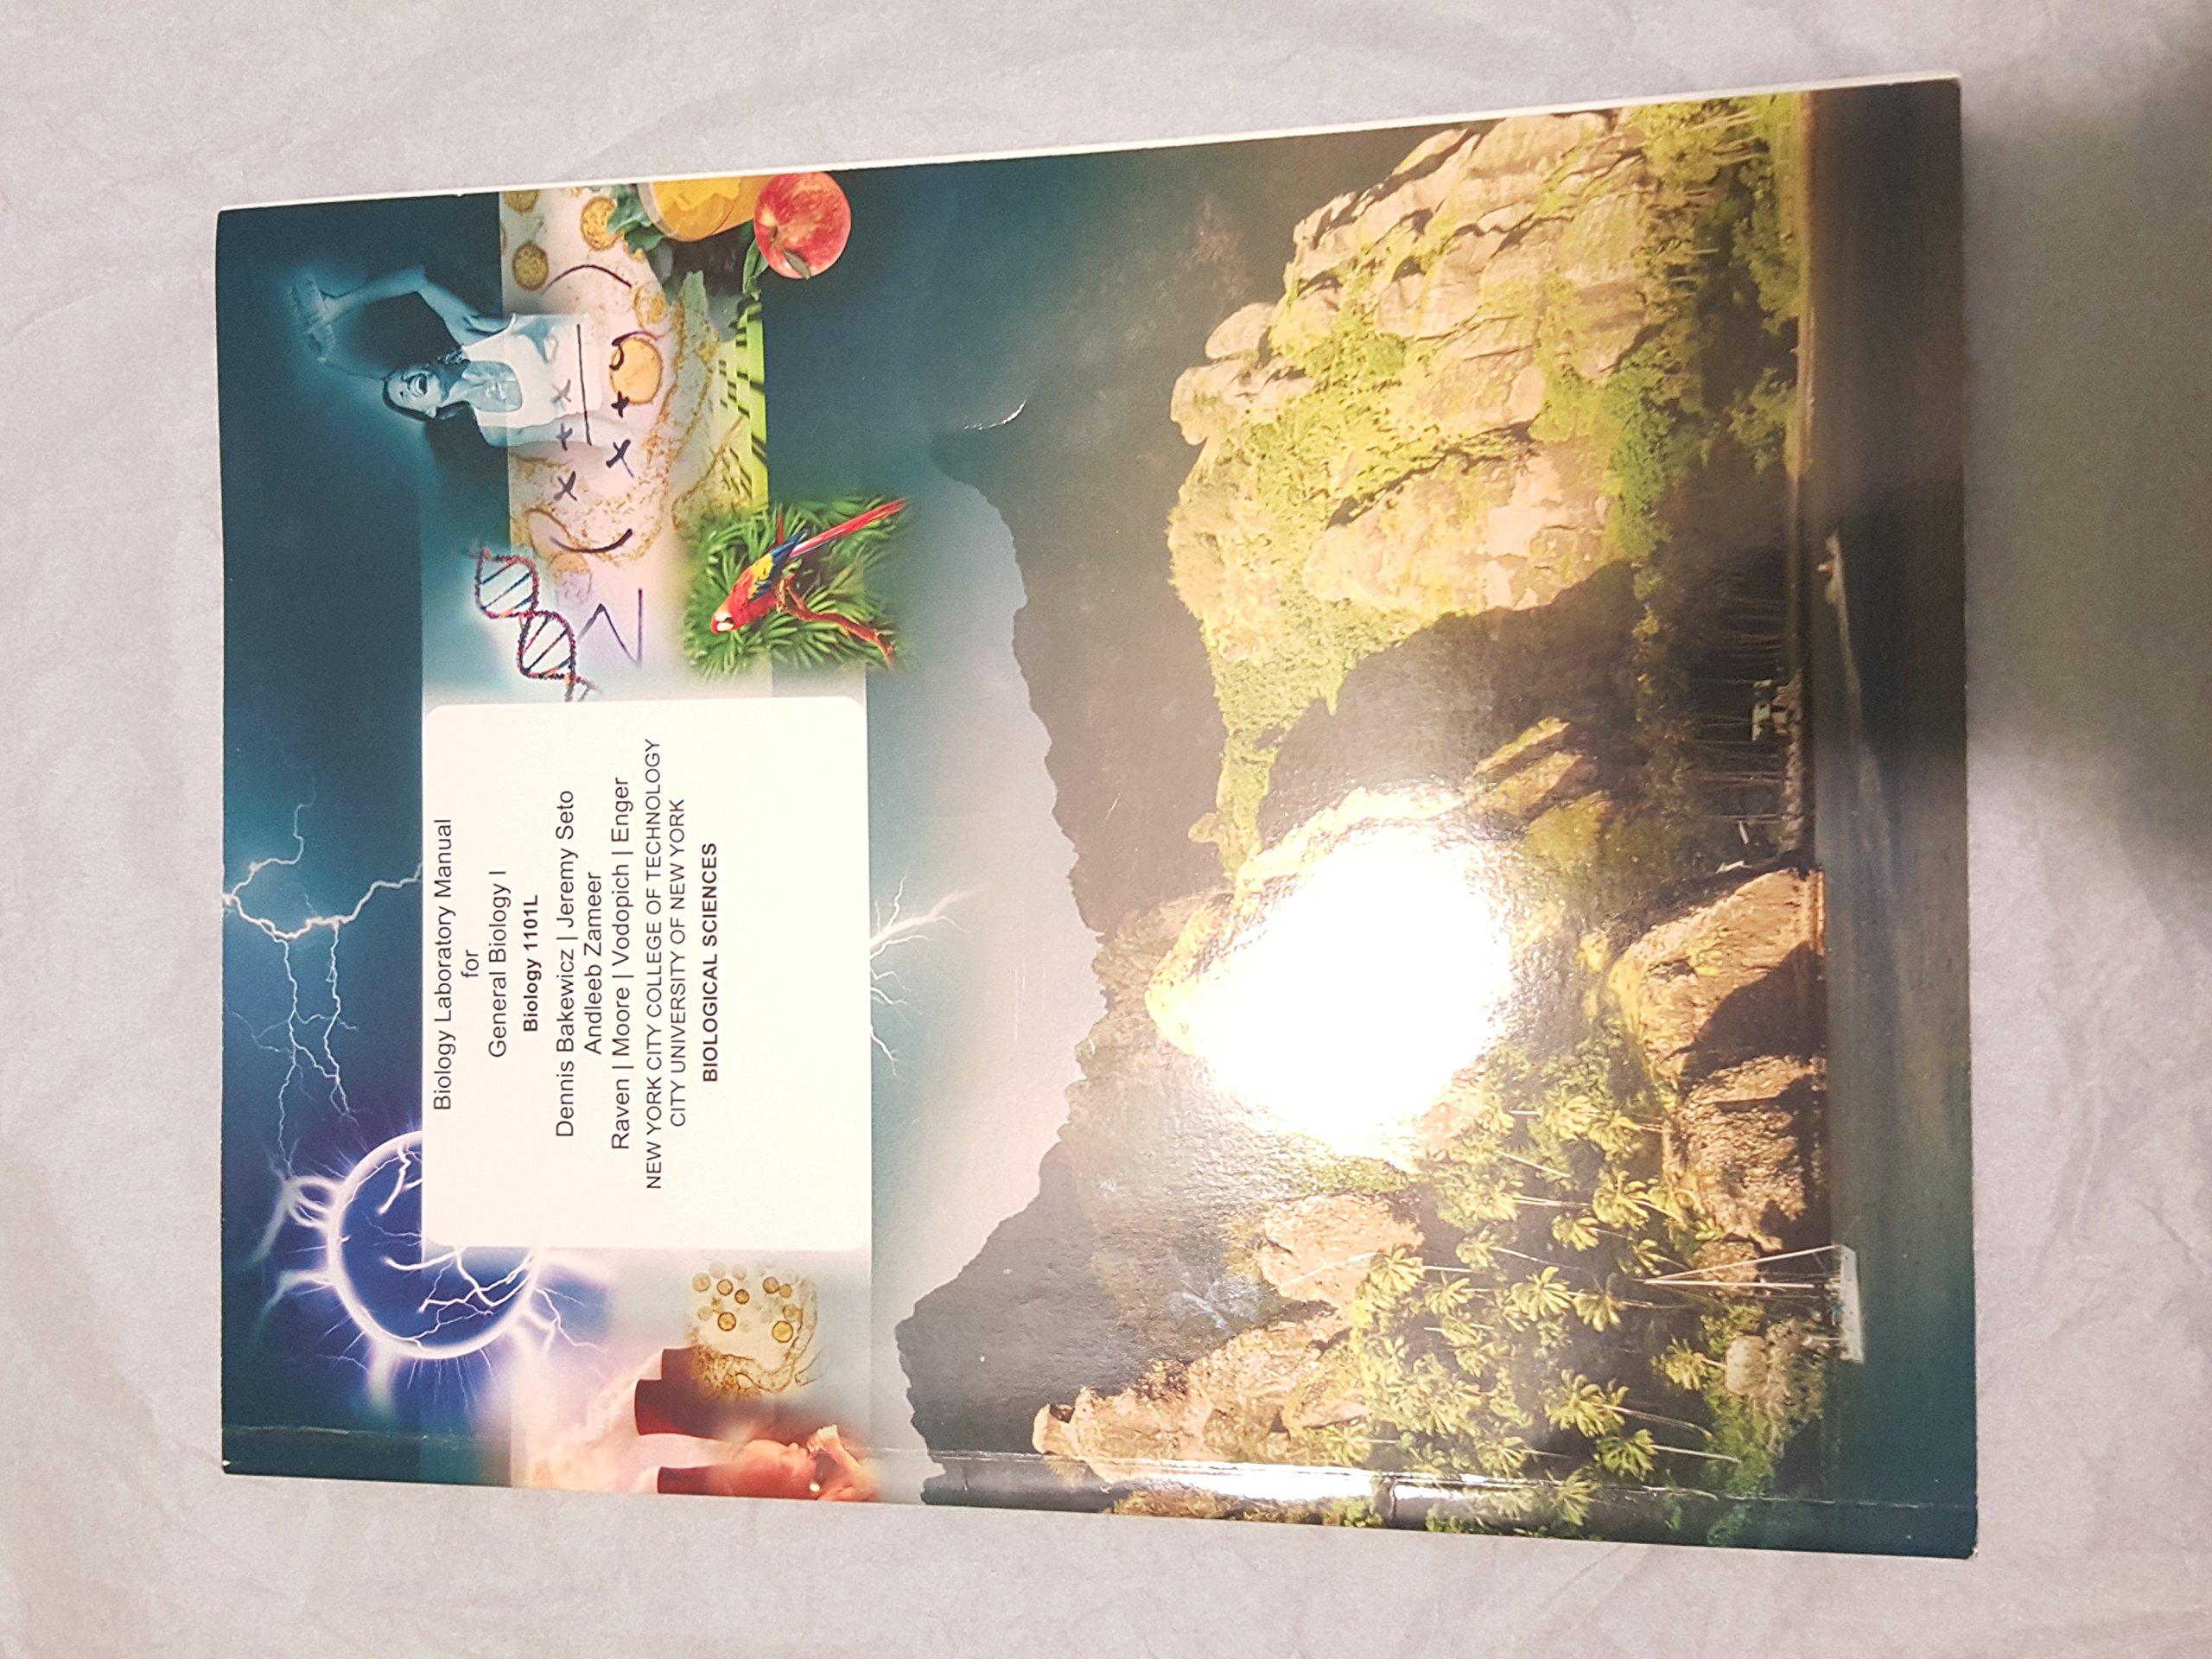 Biology Laboratory Manual for General Biology I: Dennis Bakewicz, Jeremy  Seto, Andleeb Zameer: 9781121818545: Amazon.com: Books